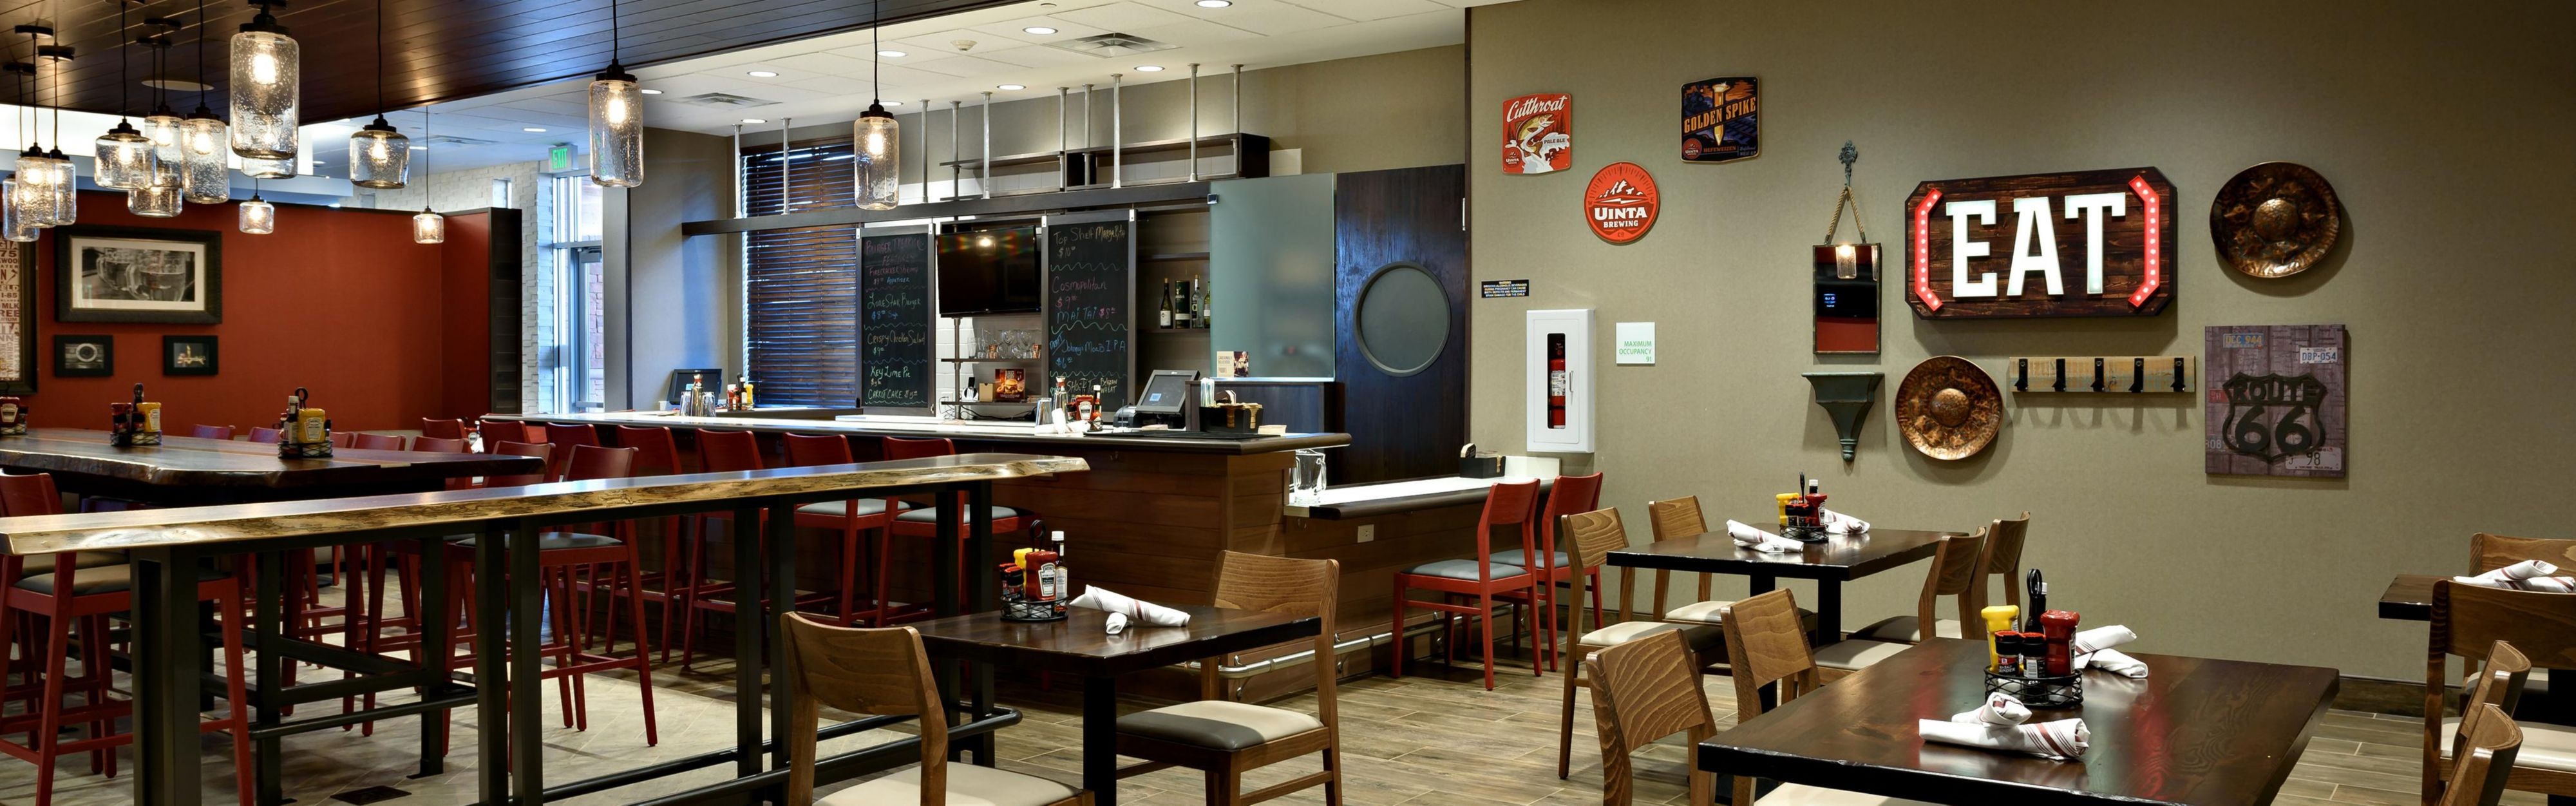 Burger Theory Restaurant  Holiday Inn St George, Utah Hotel ...